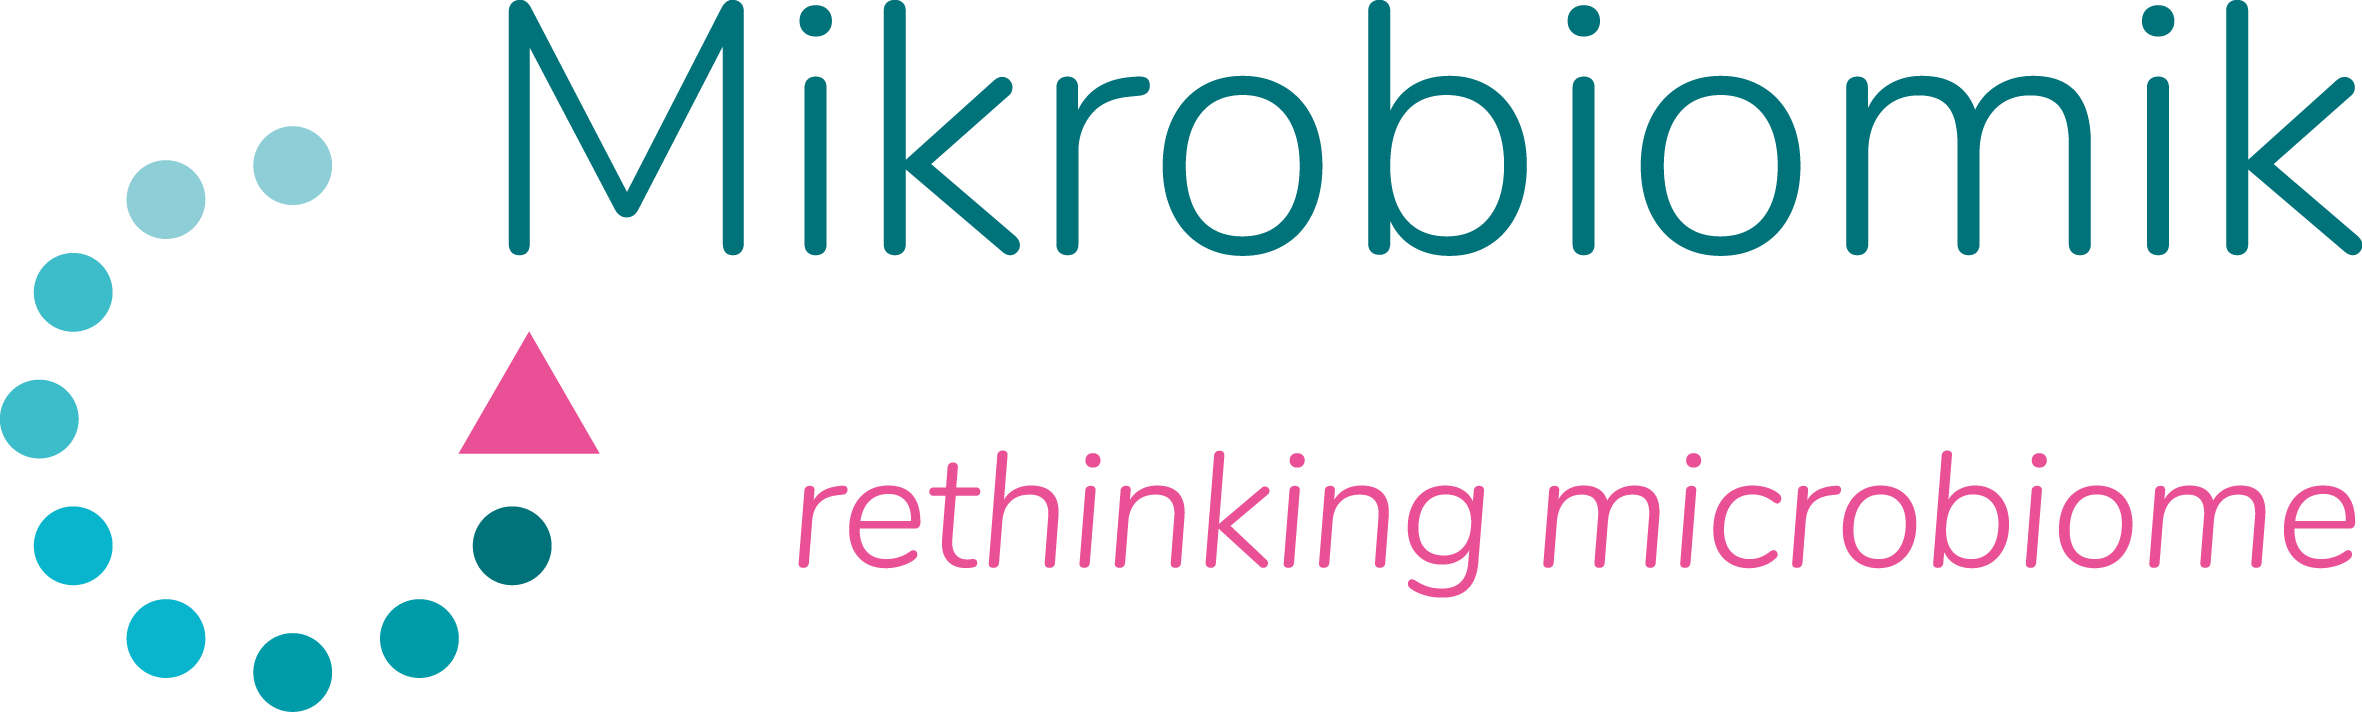 mikrobiomik logo